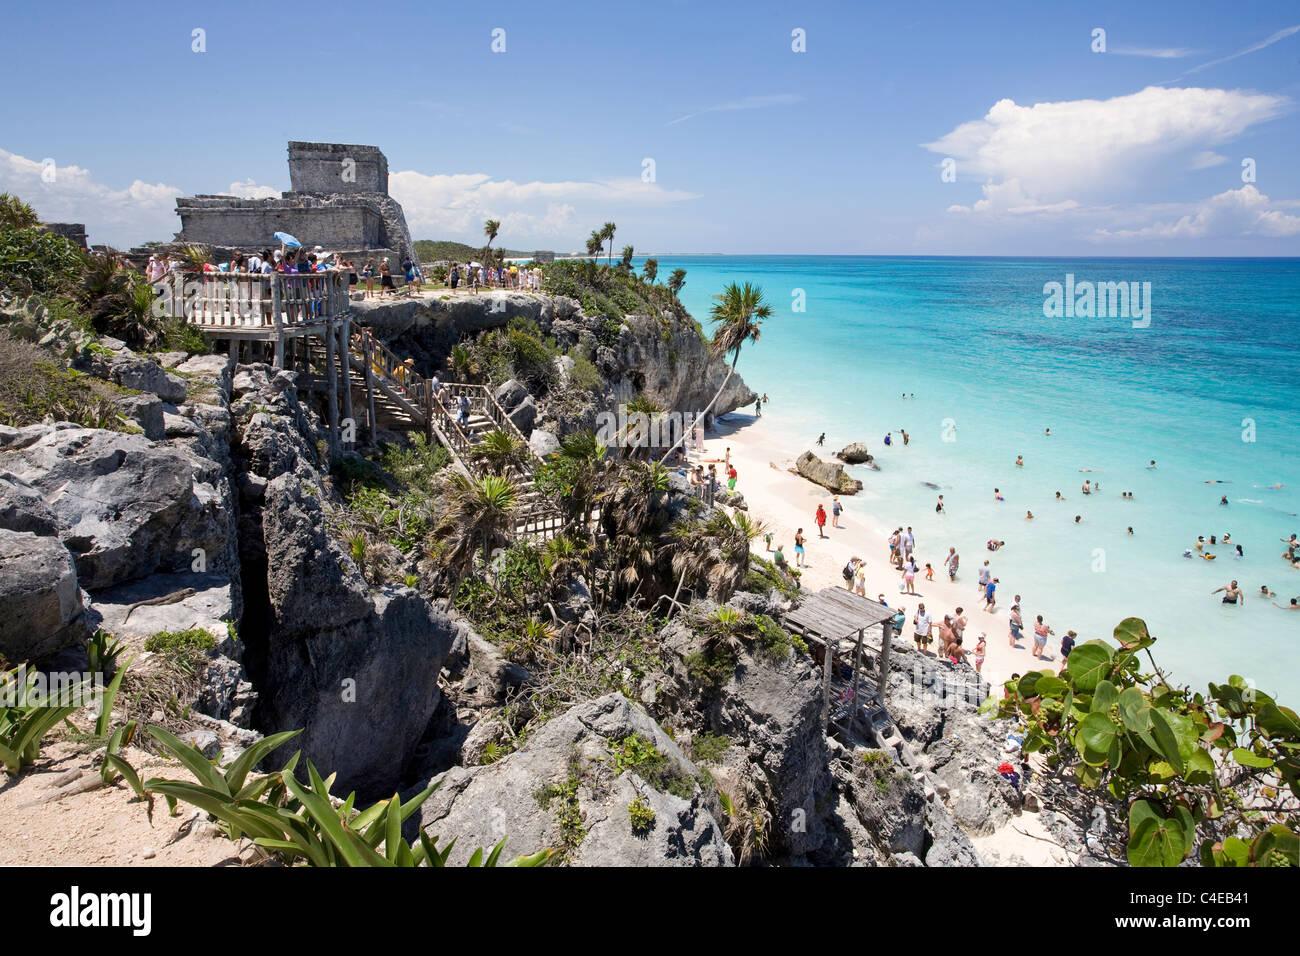 Maya ruins at Tulum, temple ruins above beach, Yucatan,Carribean sea, Mexico - Stock Image